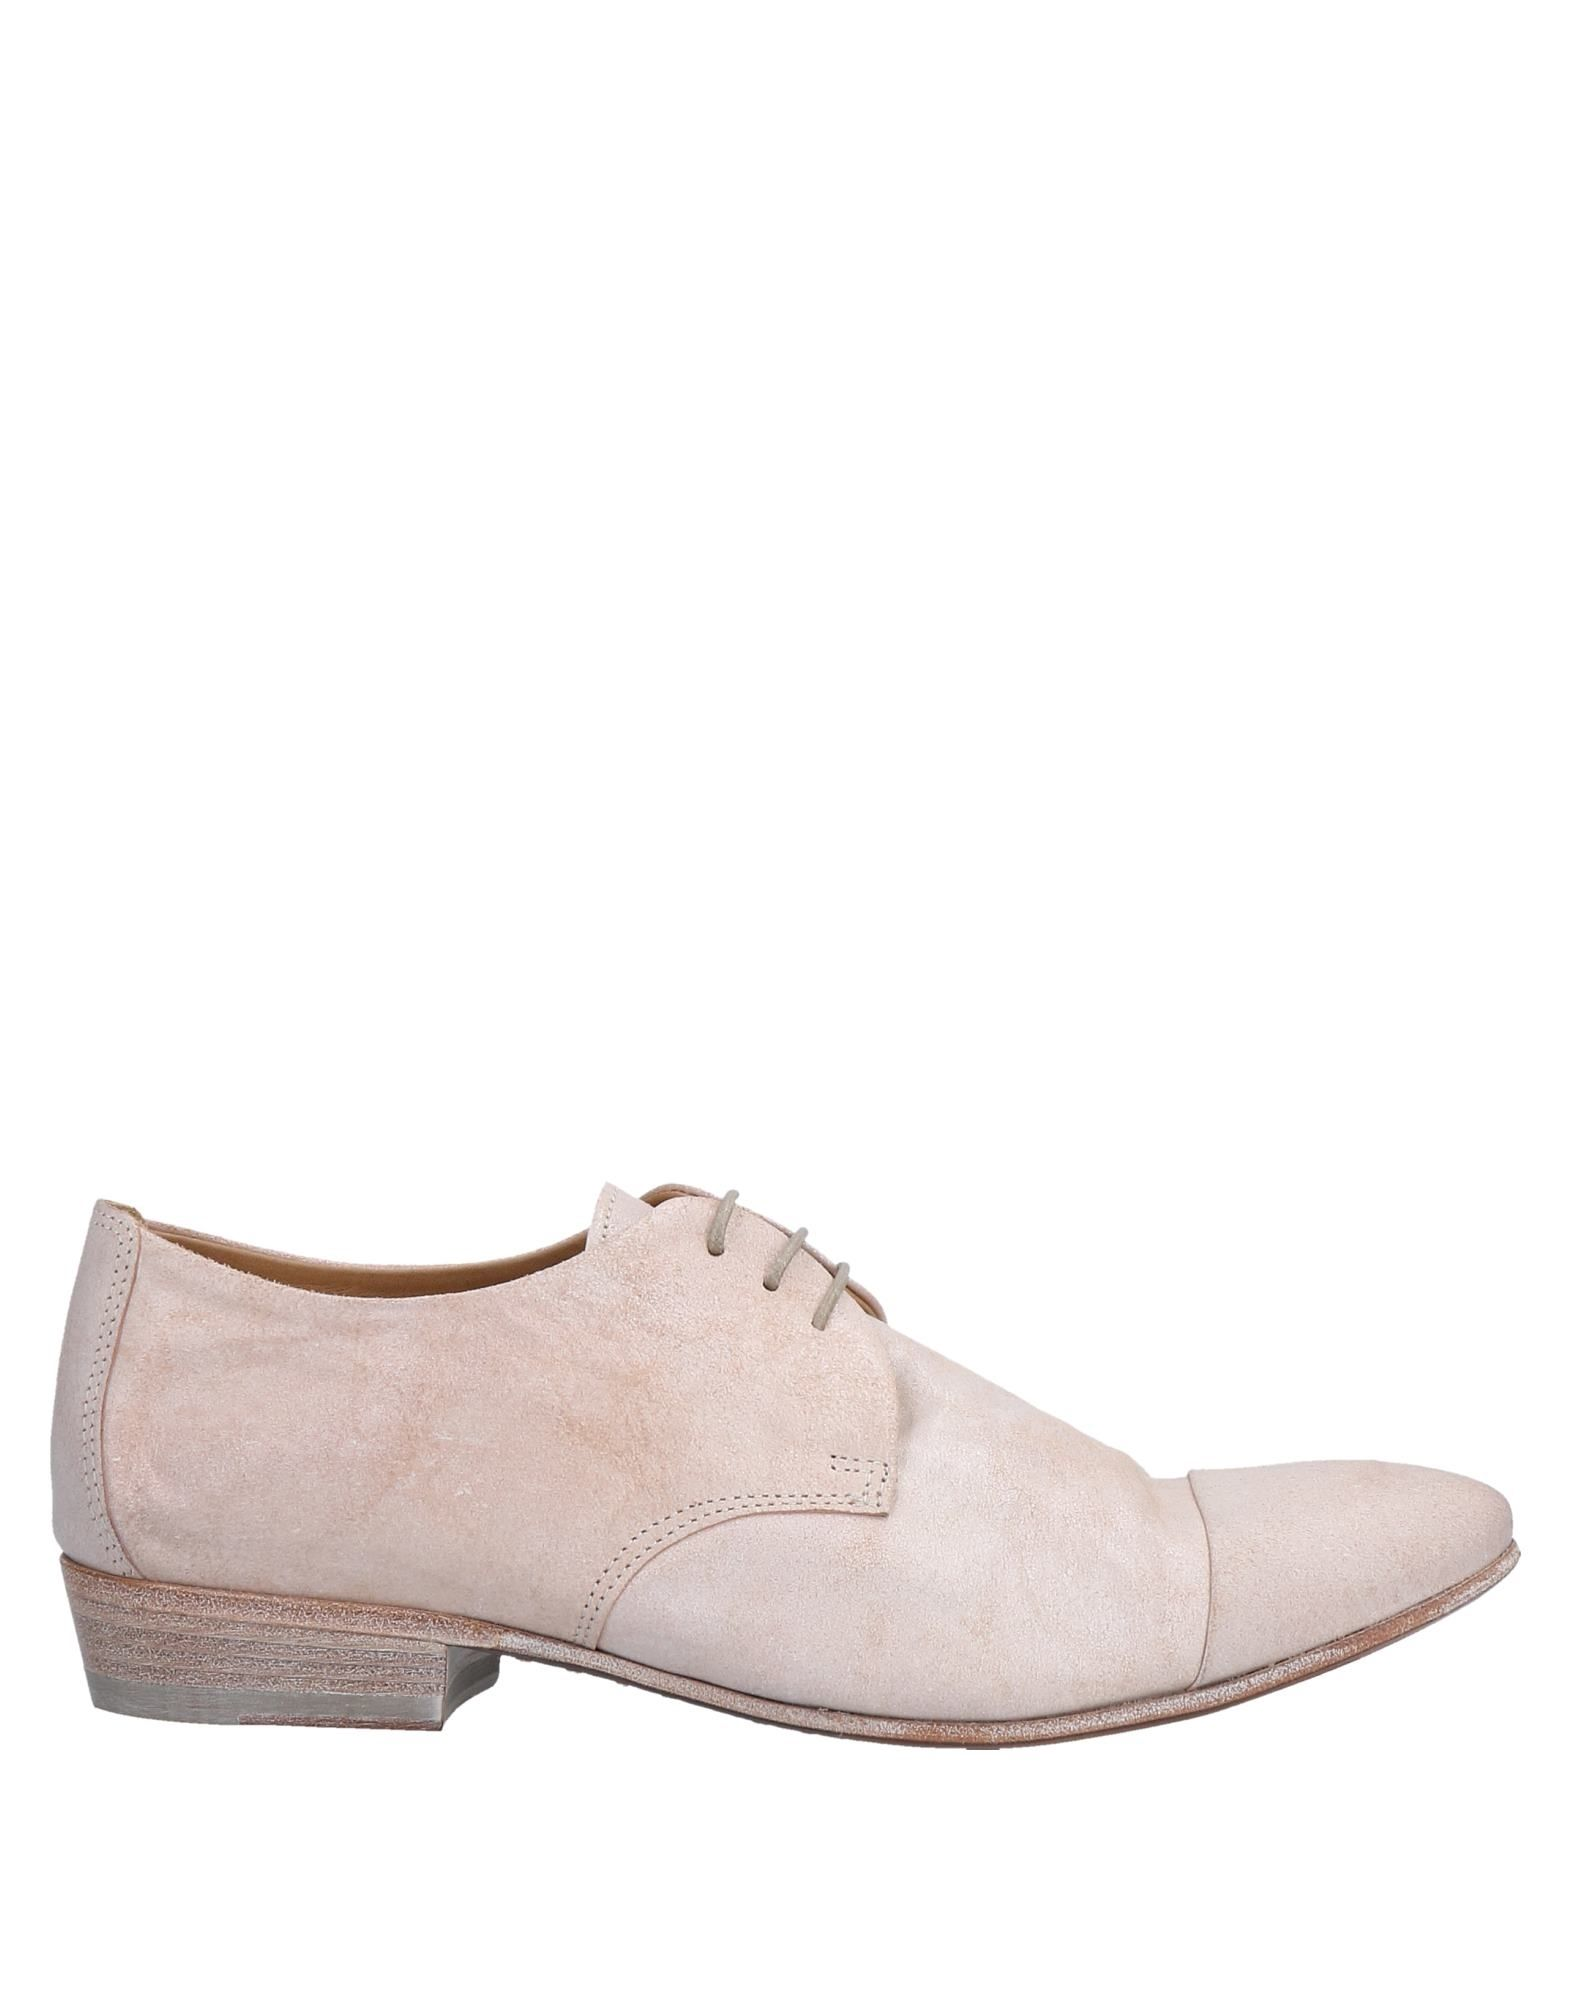 Фото - PANTANETTI Обувь на шнурках обувь на высокой платформе dkny